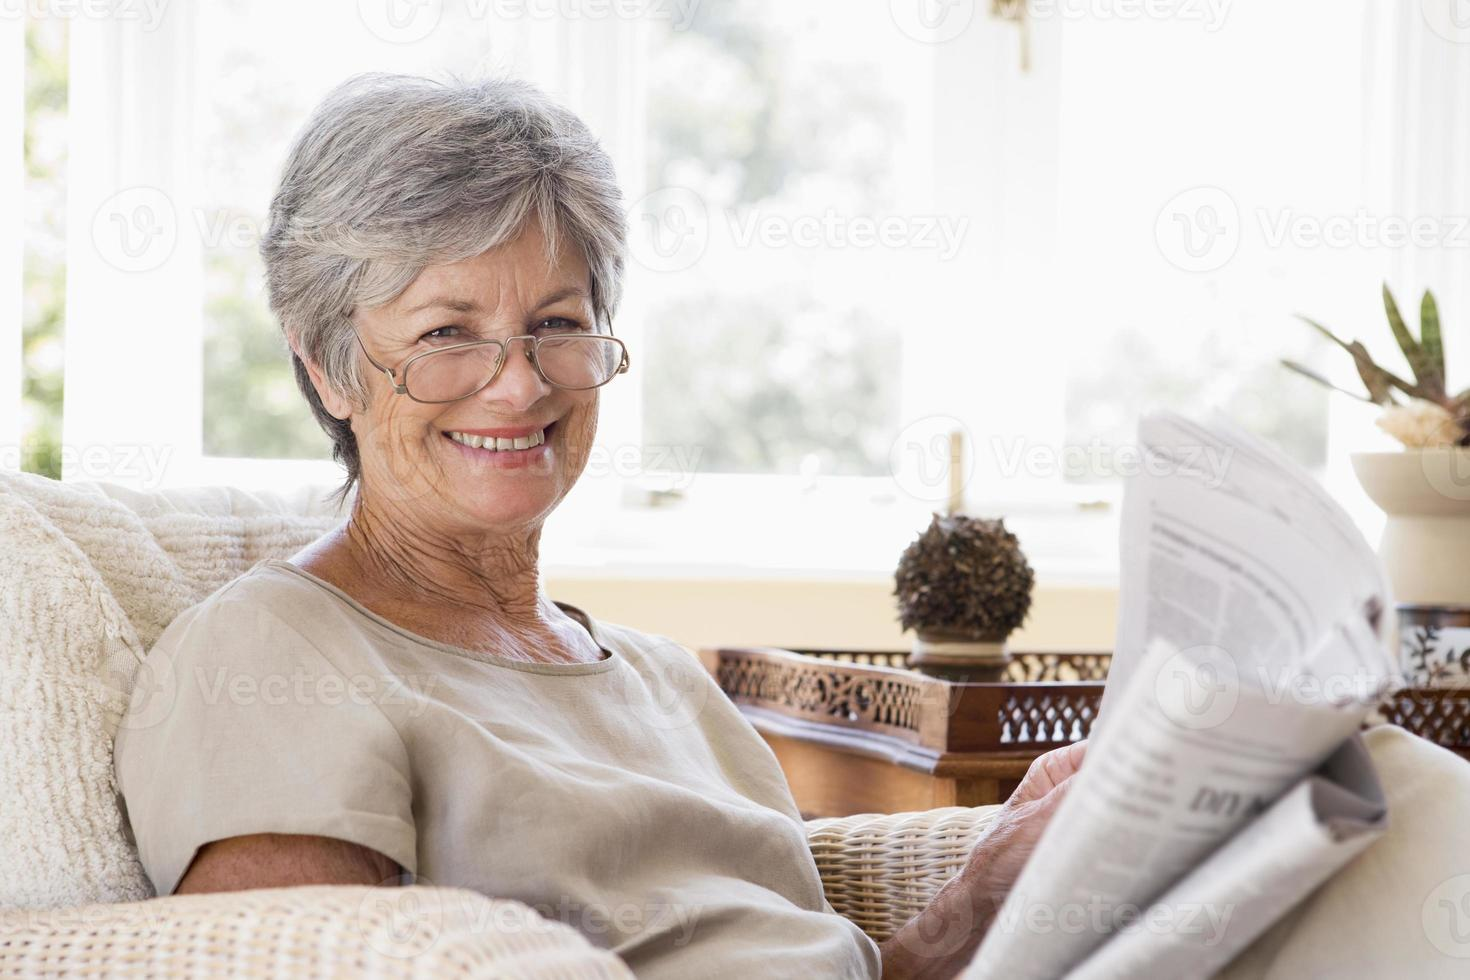 vrouw in woonkamer krant lezen glimlachen foto